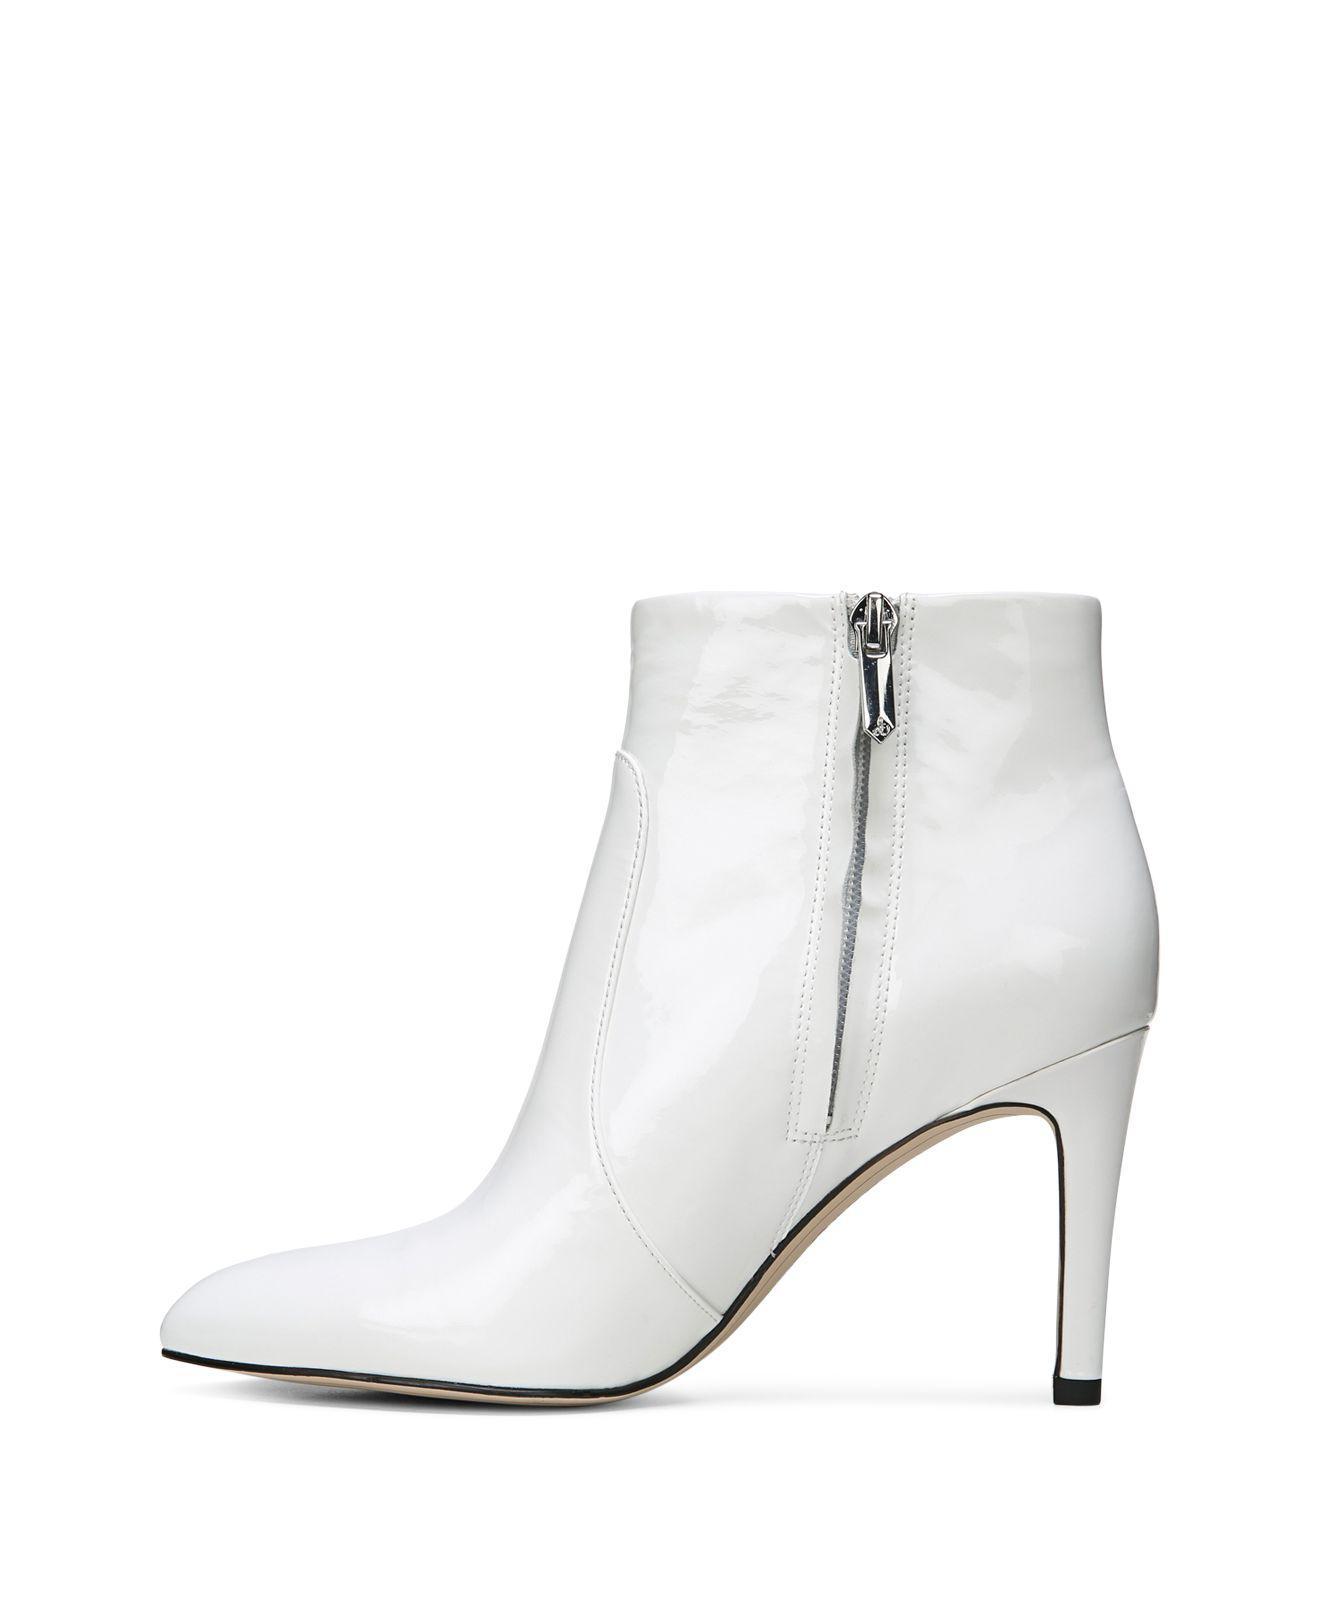 166e634d2e335b Lyst - Sam Edelman Women s Olette Patent Leather High Heel Booties ...